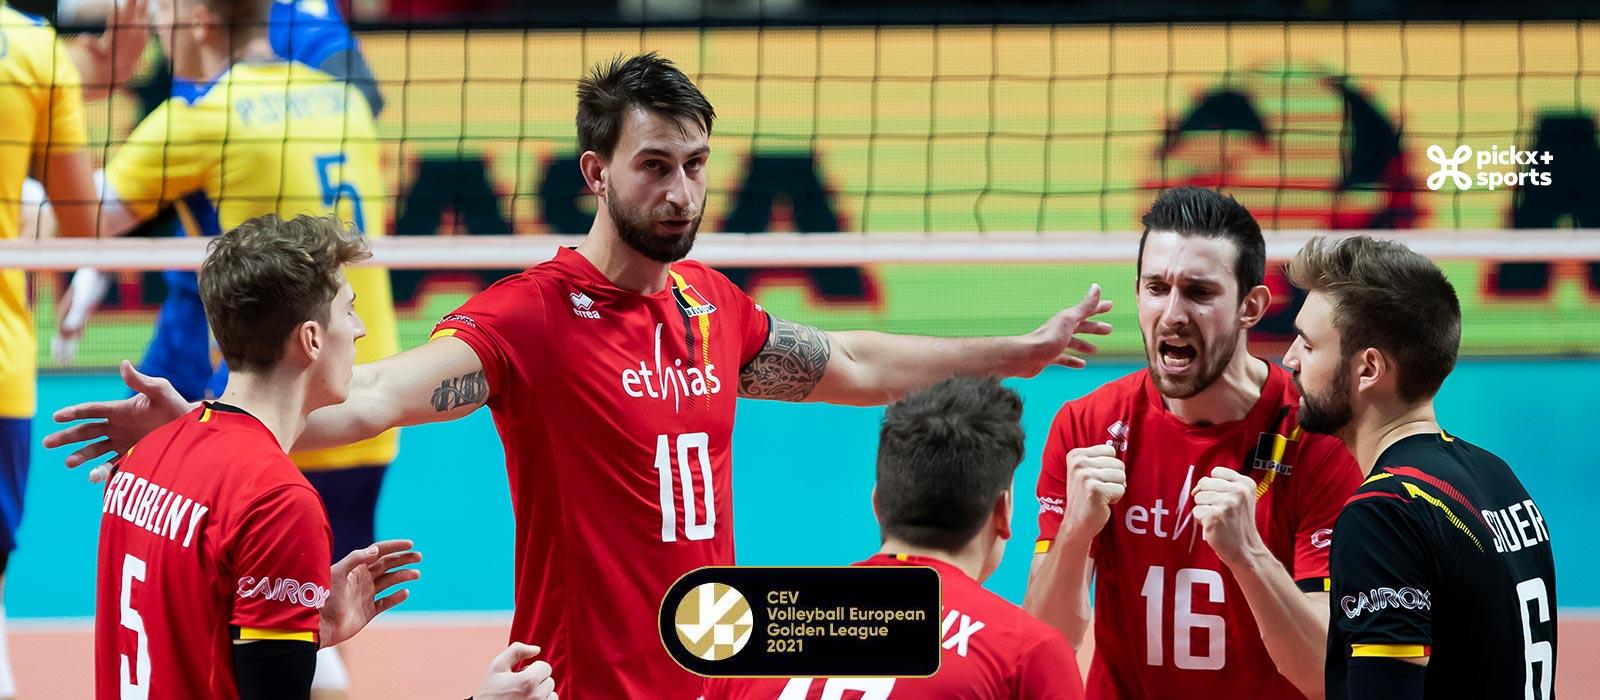 European Volleyball League